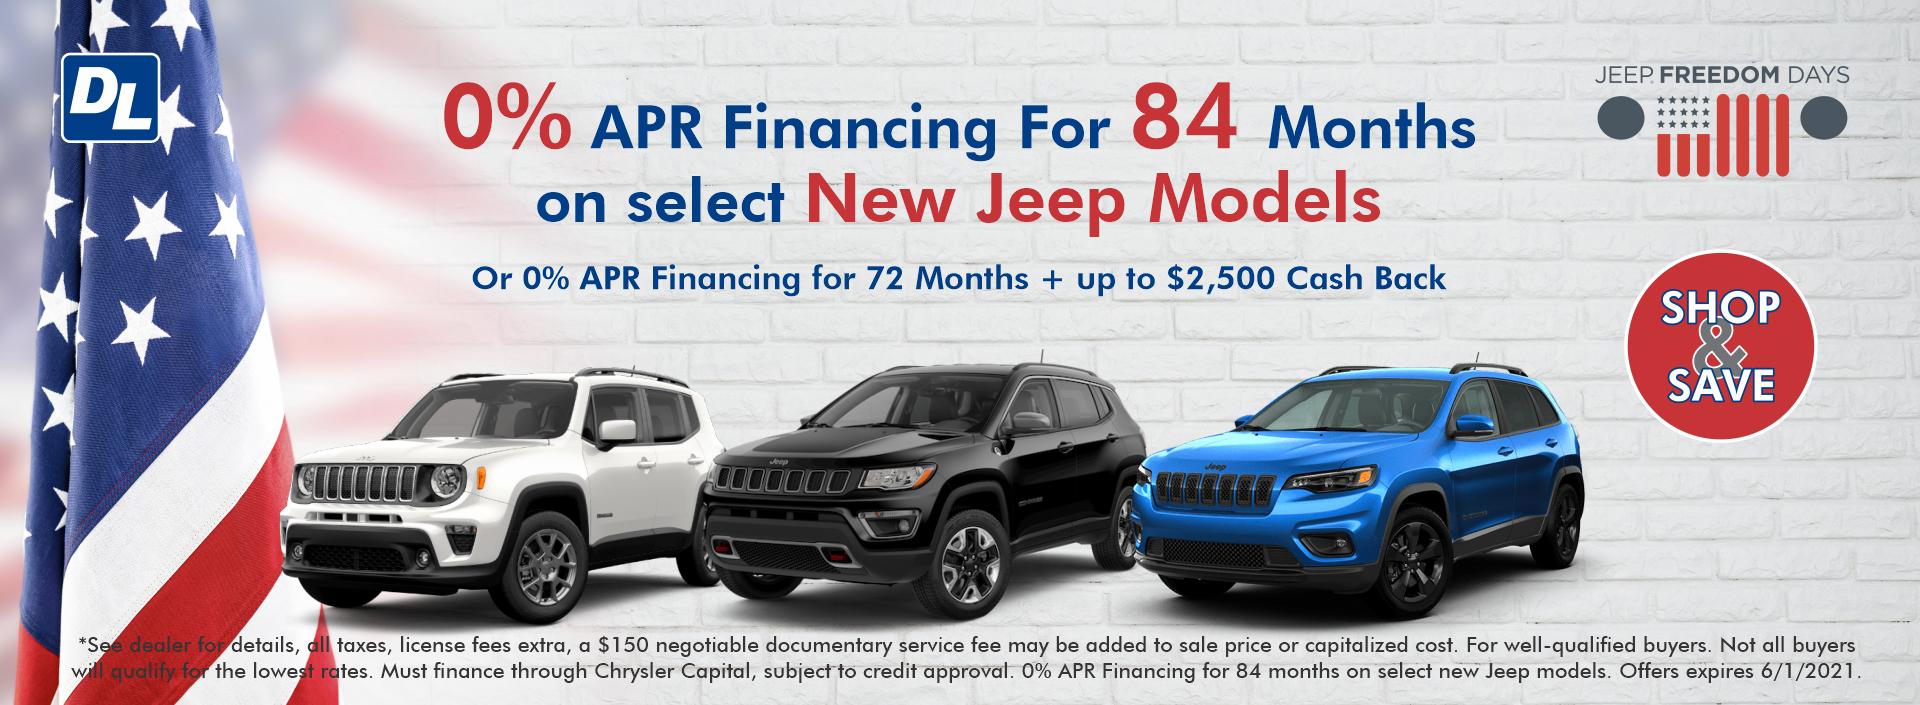 2021MayBanners-CDJR-Jeep